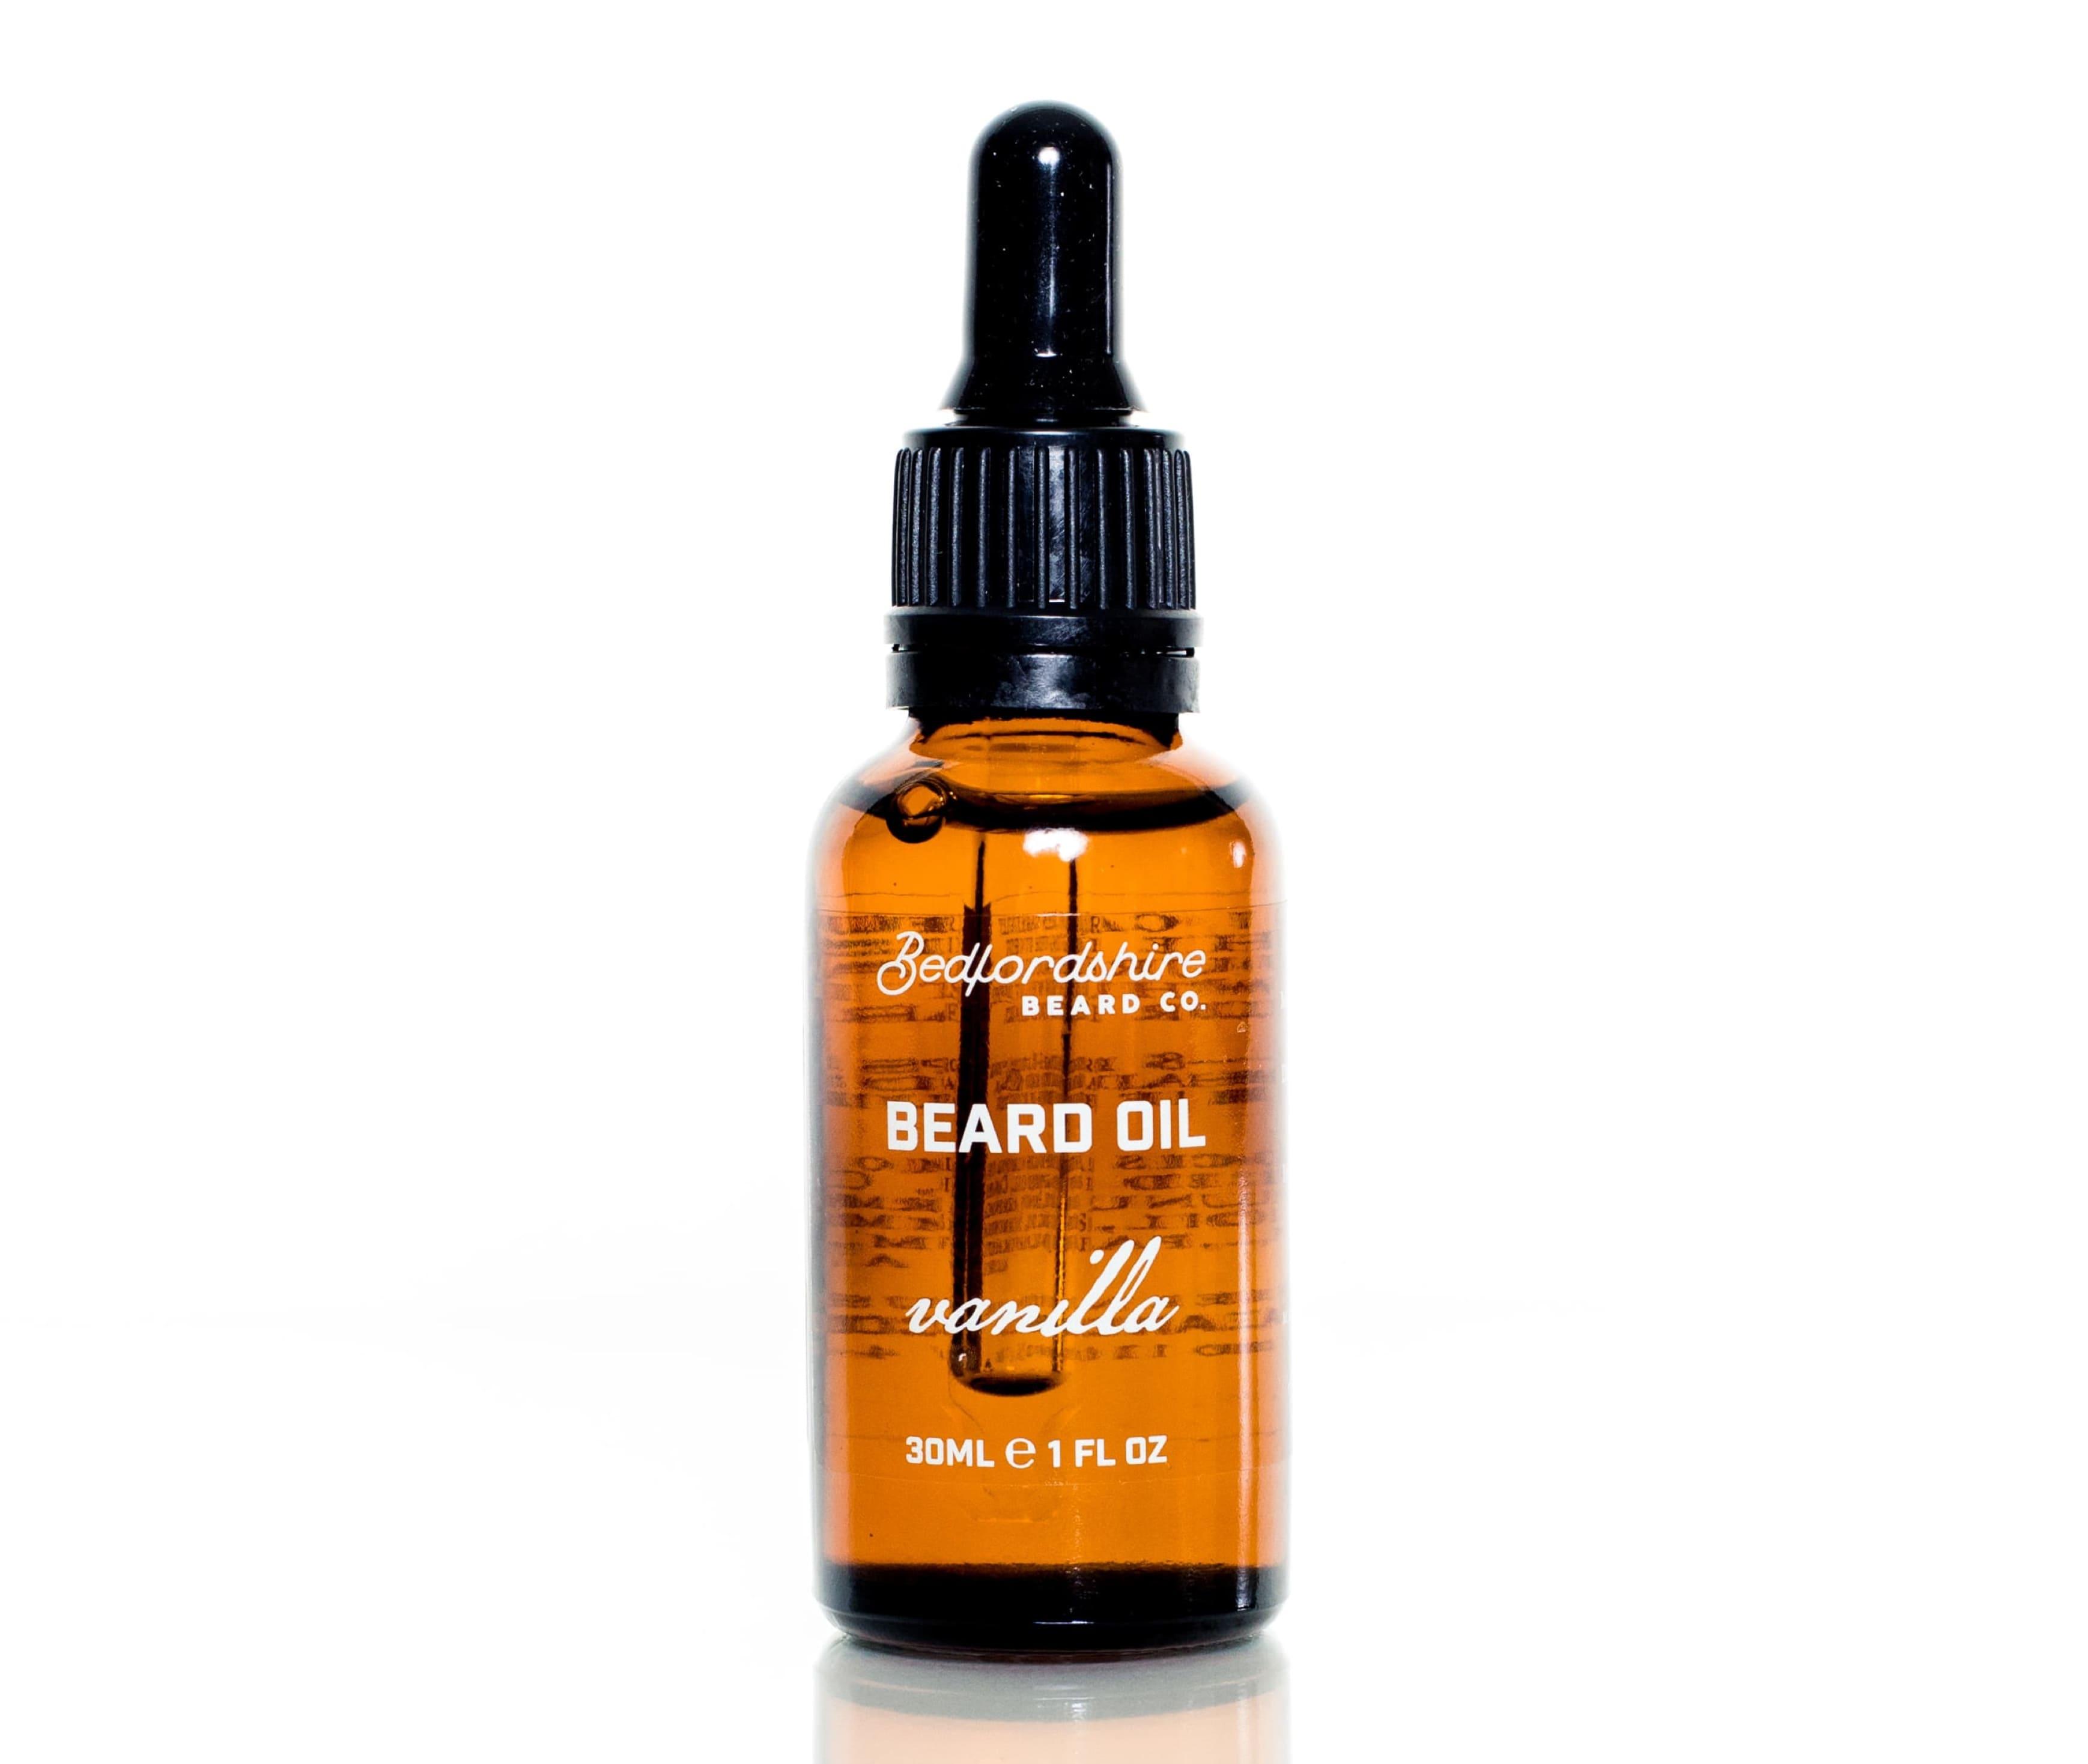 Óleo para barba baunilha bedfordshire beard co barbudos